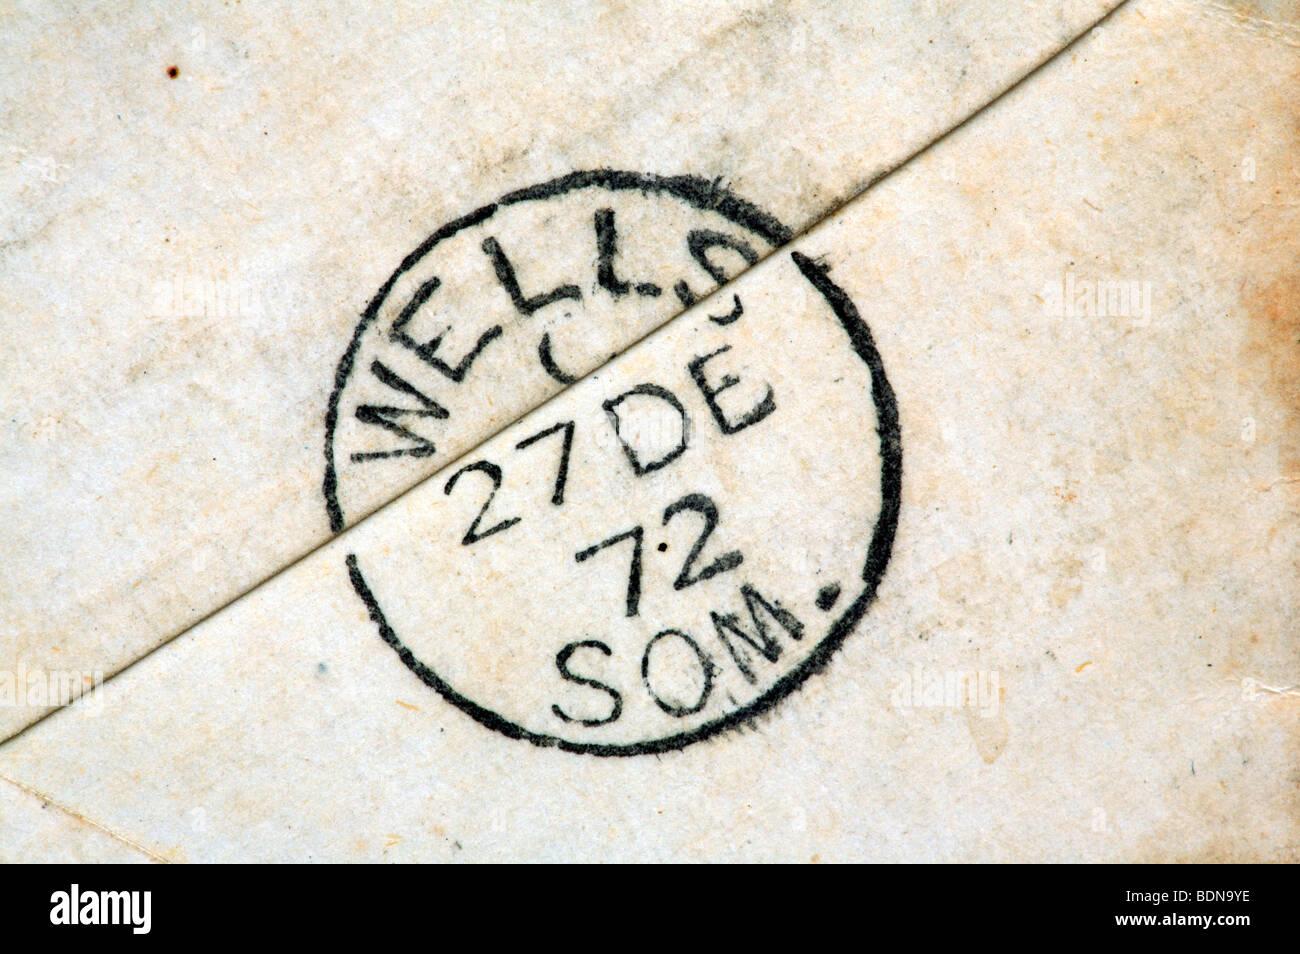 Postmark on reverse of envelope dated 27 December 1872 at Wells, Somerset, England. - Stock Image